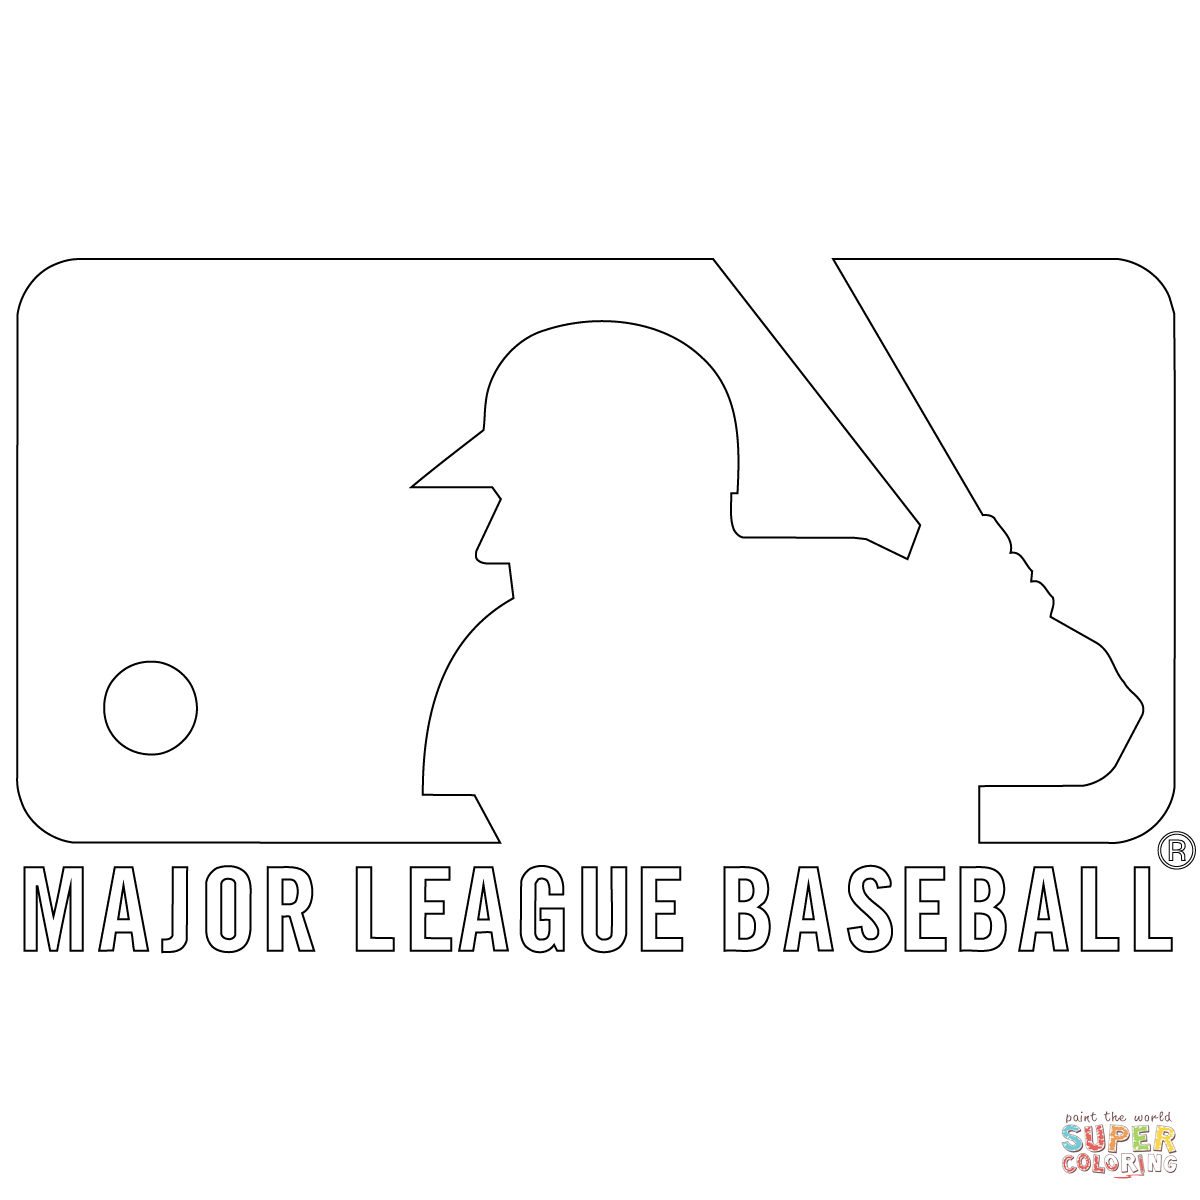 Mlb Logo Coloring Page   Free Printable Coloring Pages - Free Printable Baseball Logos